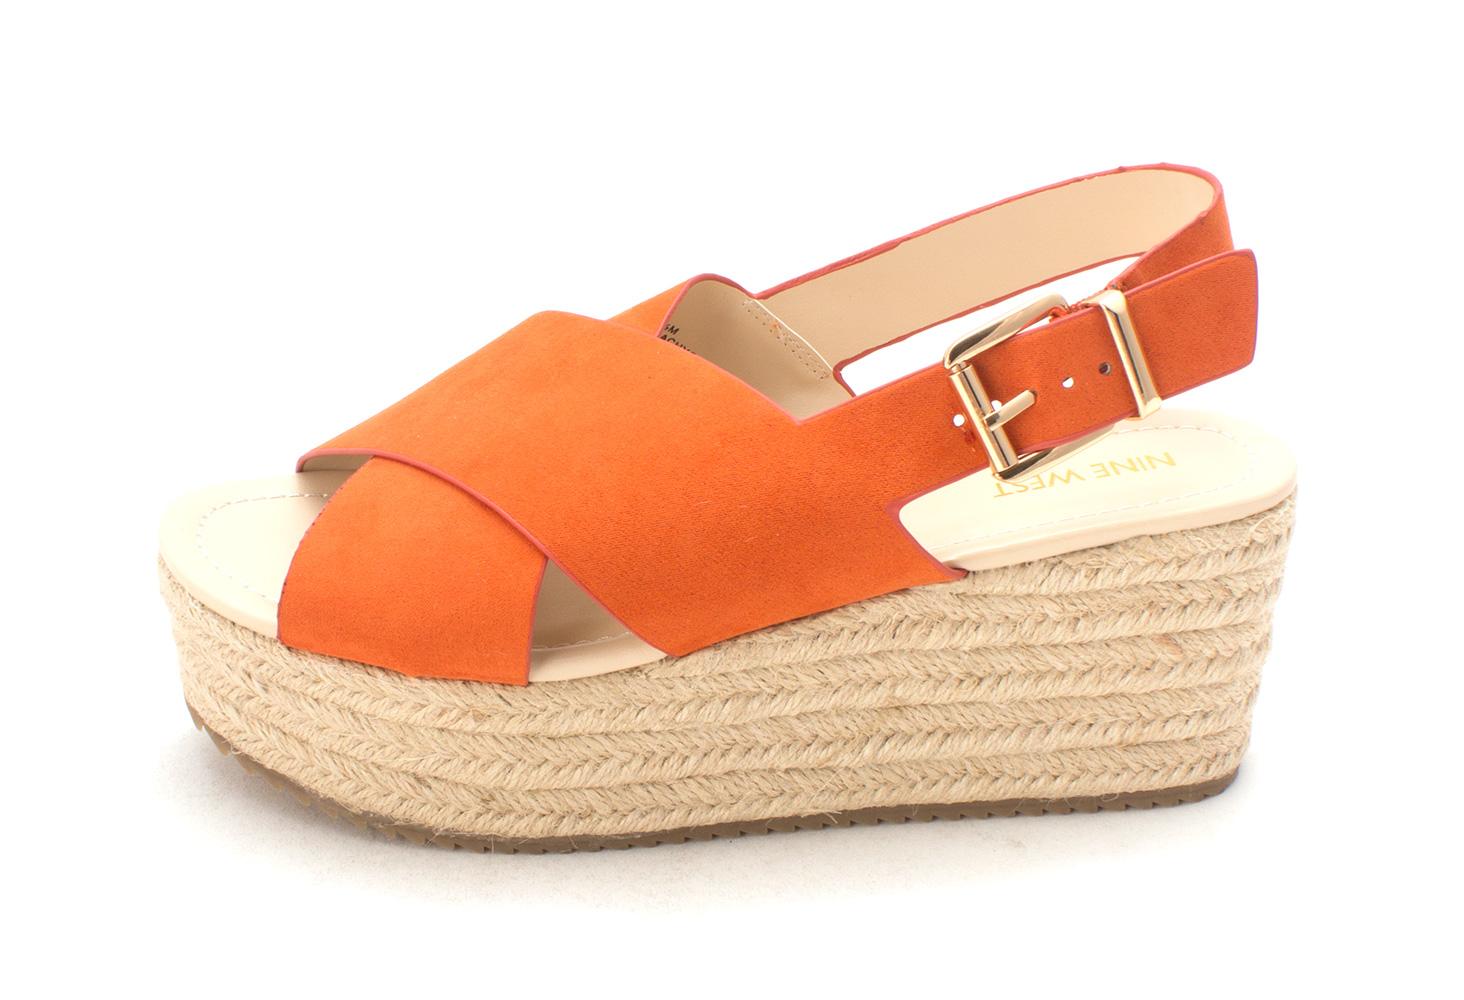 Nine West Womens beachygd Open Toe Casual Platform Sandals Orange fb Size 85